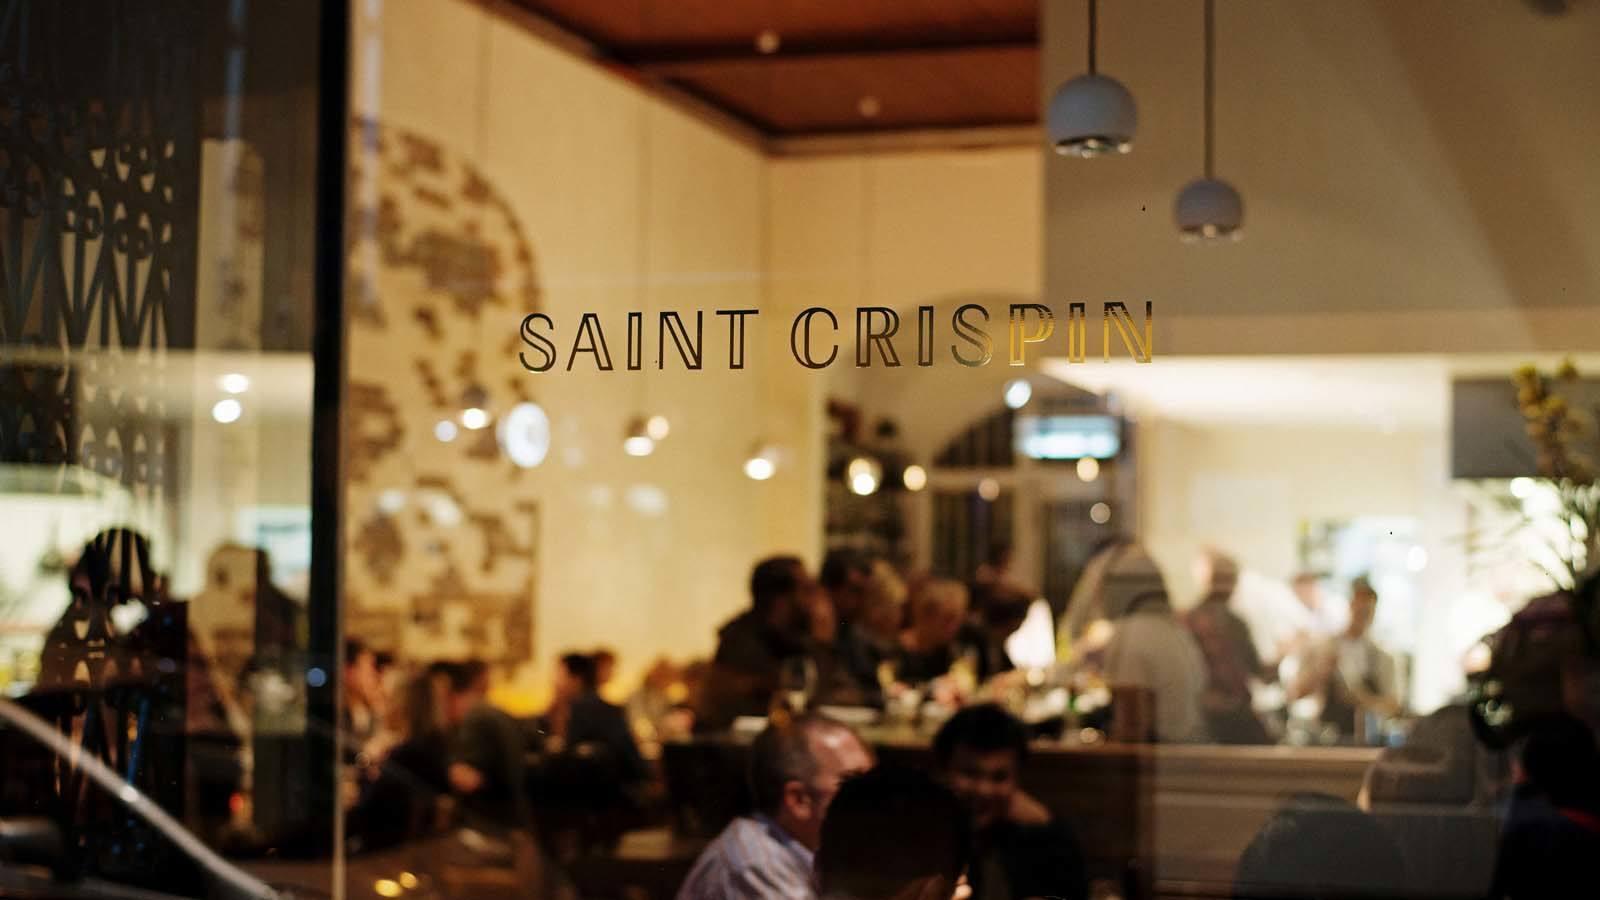 Saint Crispin, Collingwood, Melbourne, Victoria, Australia